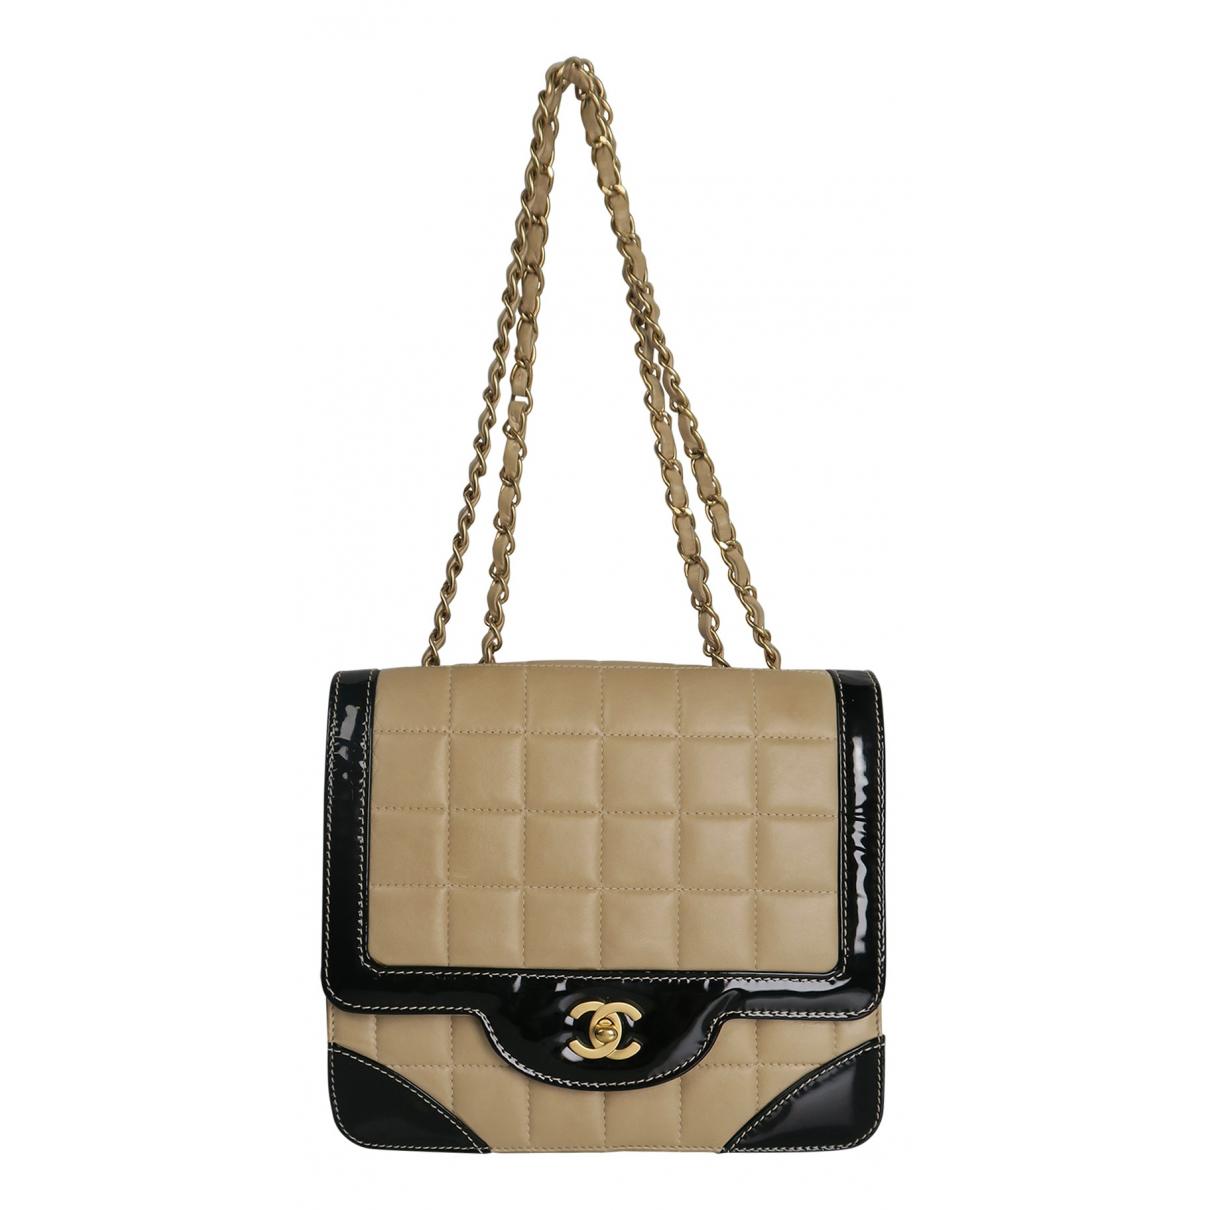 Chanel N Multicolour Leather handbag for Women N